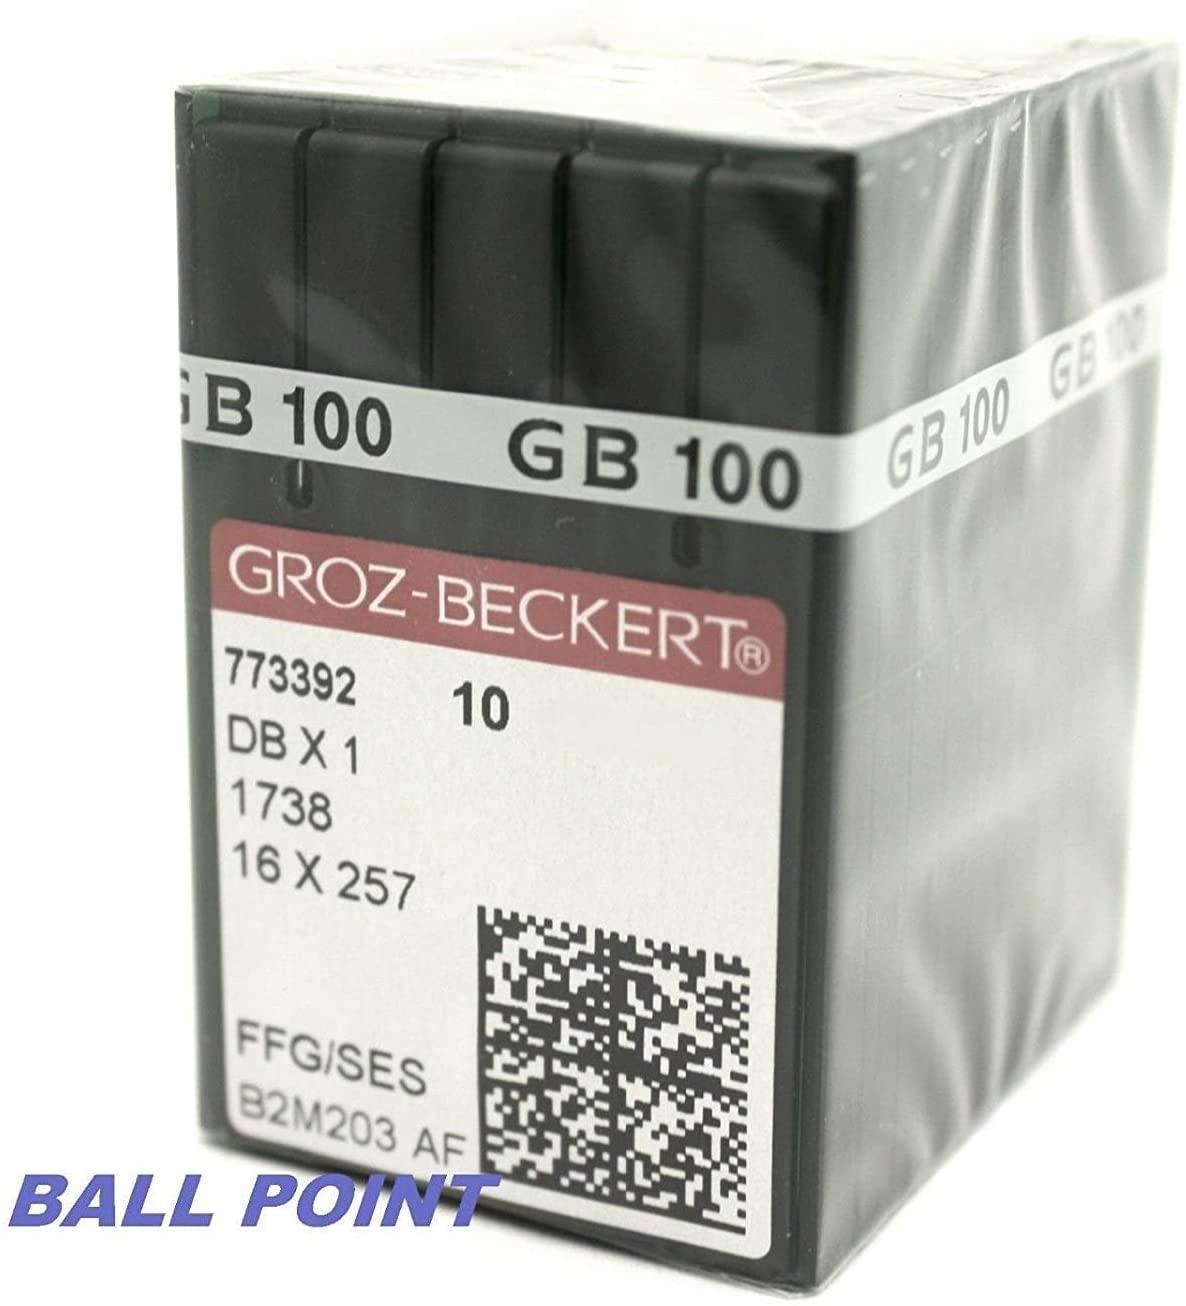 100 Groz Beckert Ball-Point (FFG/SES) 16X231 16X257 DBX1 Sewing Machine Needles (Size 11 (Metric Size 75))